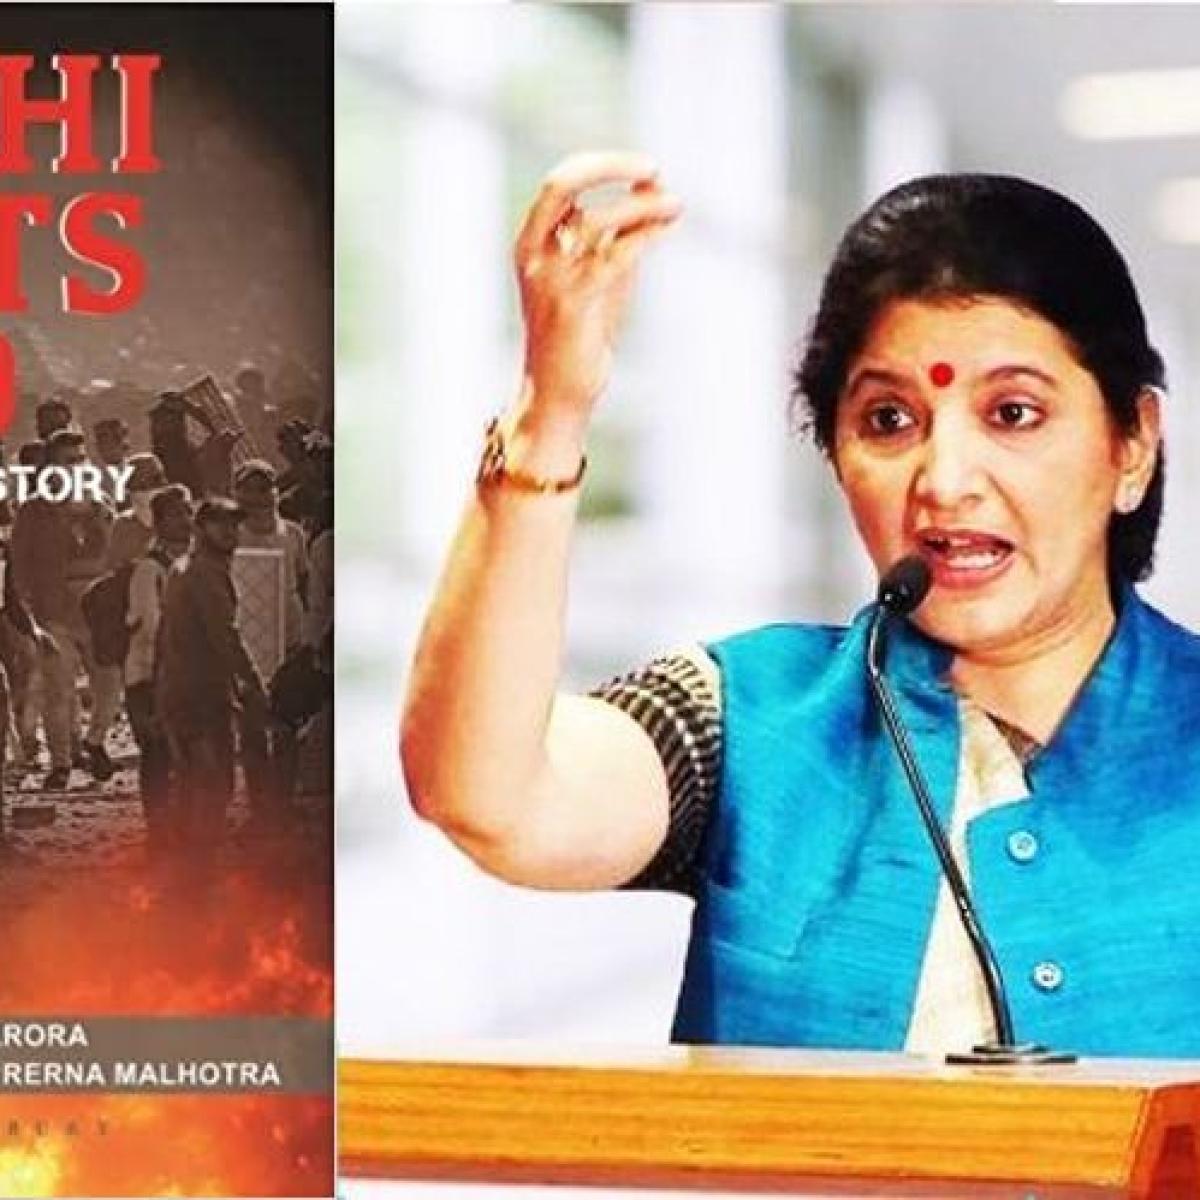 Delhi Riots 2020: Writer files complaint against Bloomsbury, Aatish Taseer, William Dalrymple, Saket Gokhale and others